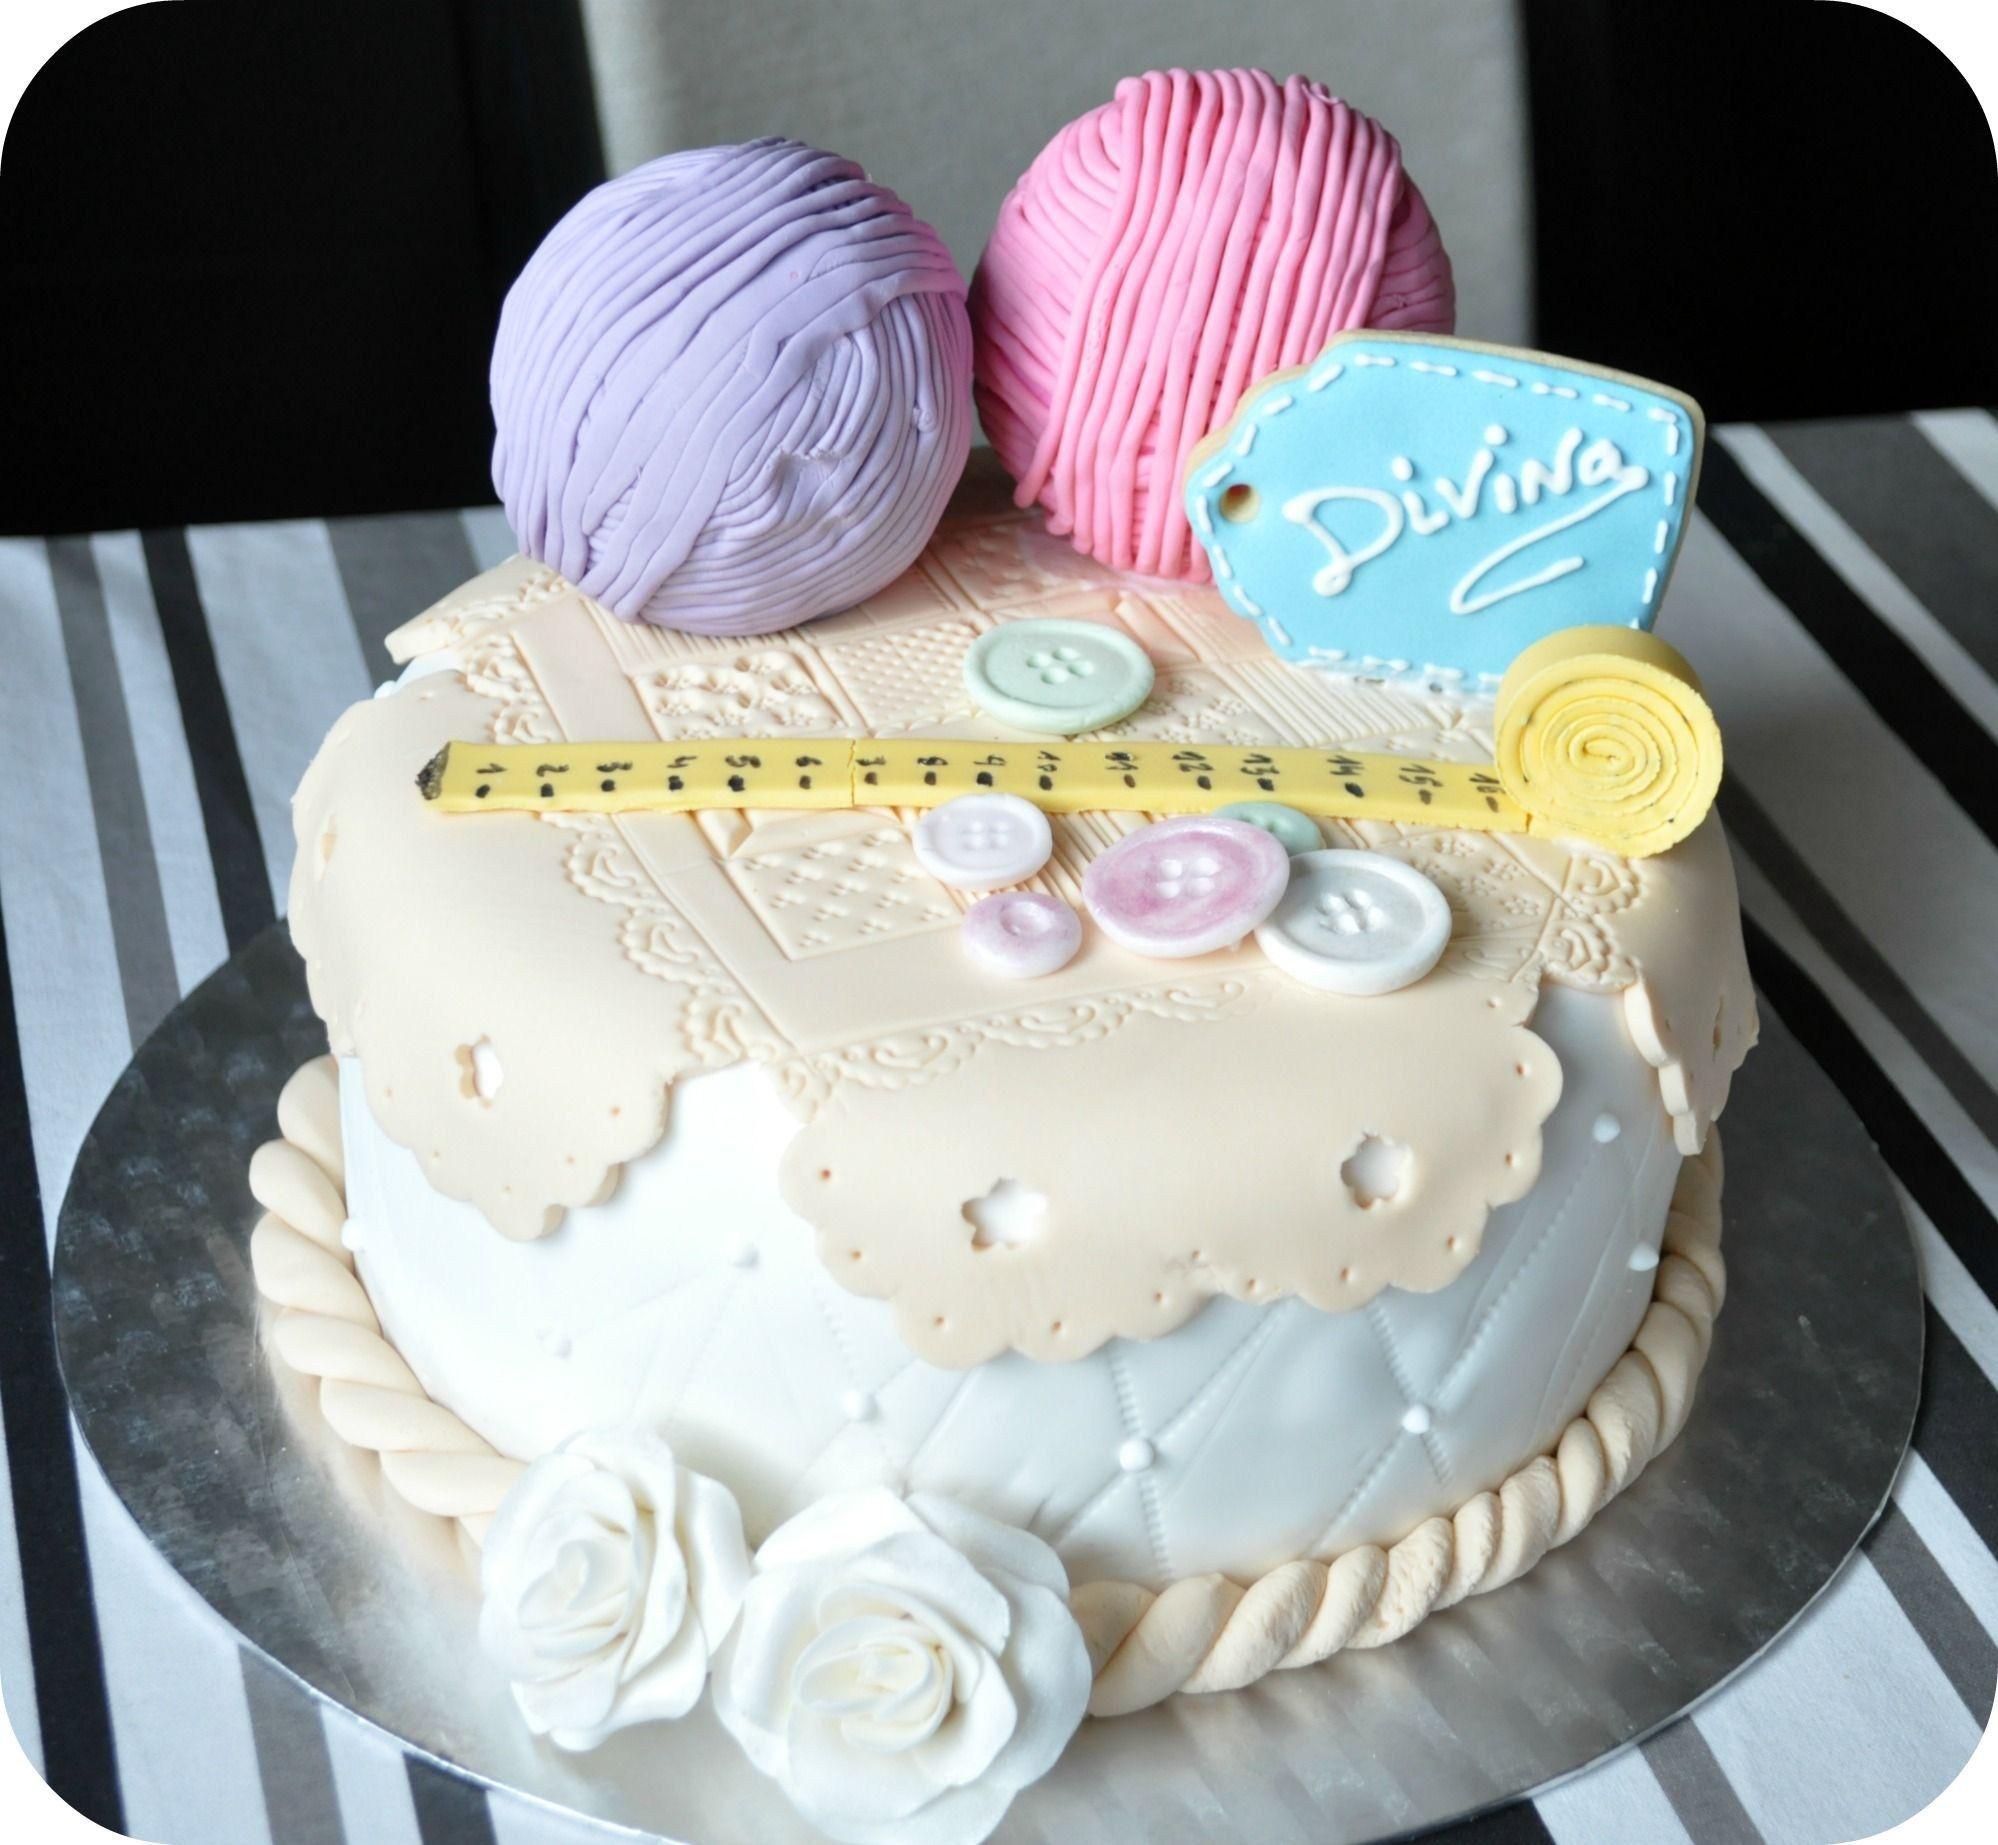 Amazing Grandma Birthday Cake Grandma Love To Corchet Great Idea For Cake Funny Birthday Cards Online Kookostrdamsfinfo